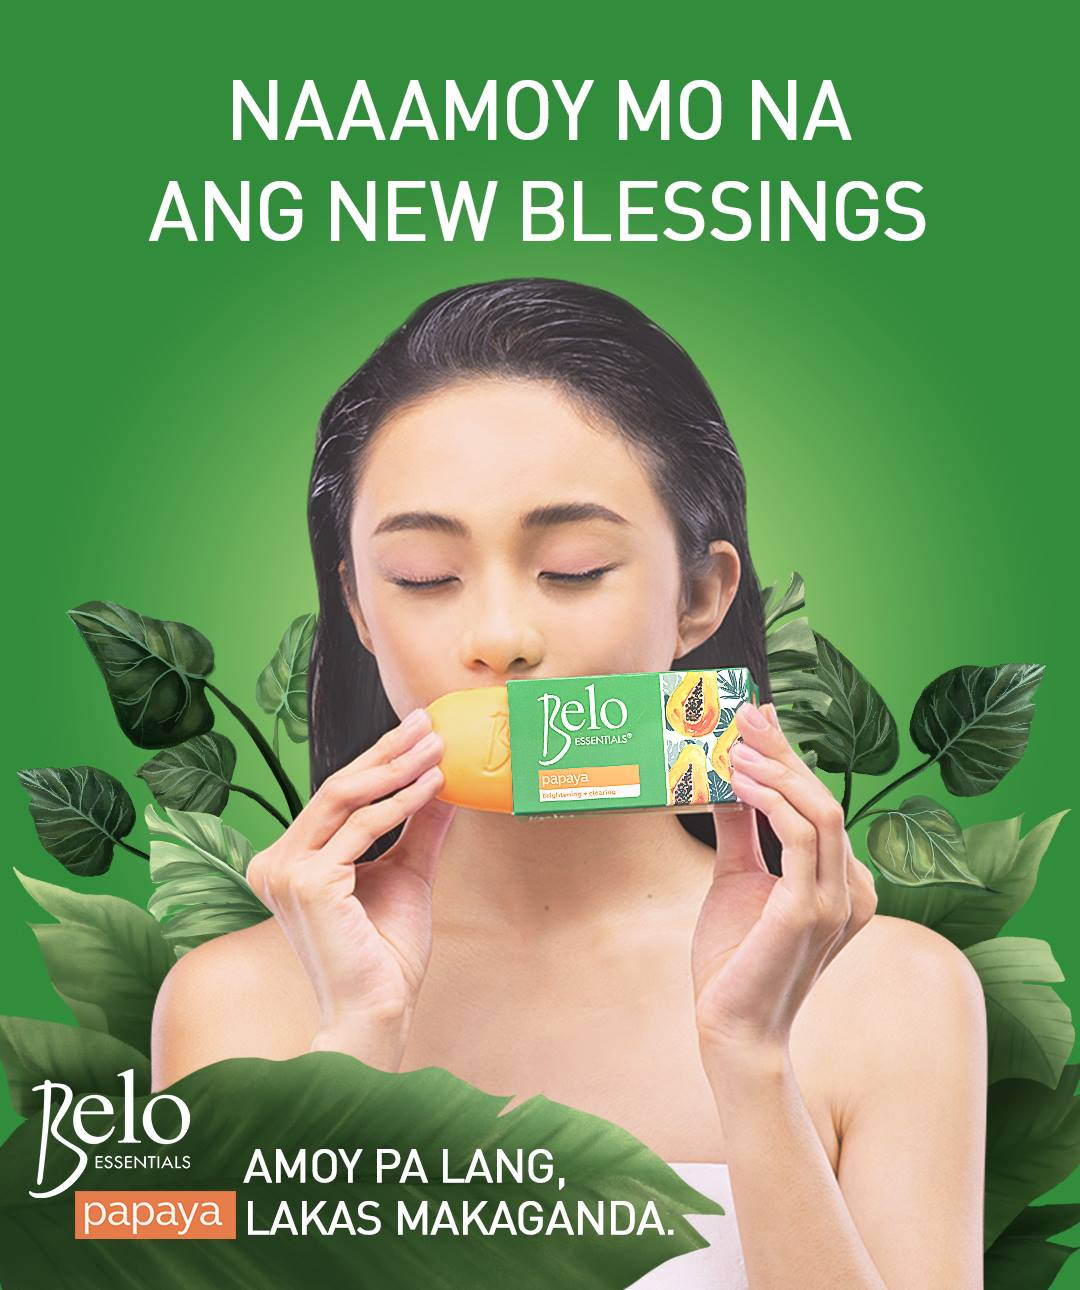 nolisoli nolisoli.ph fixture beauty standards maymay entrata vicky belo essentials whitening papaya soap morena